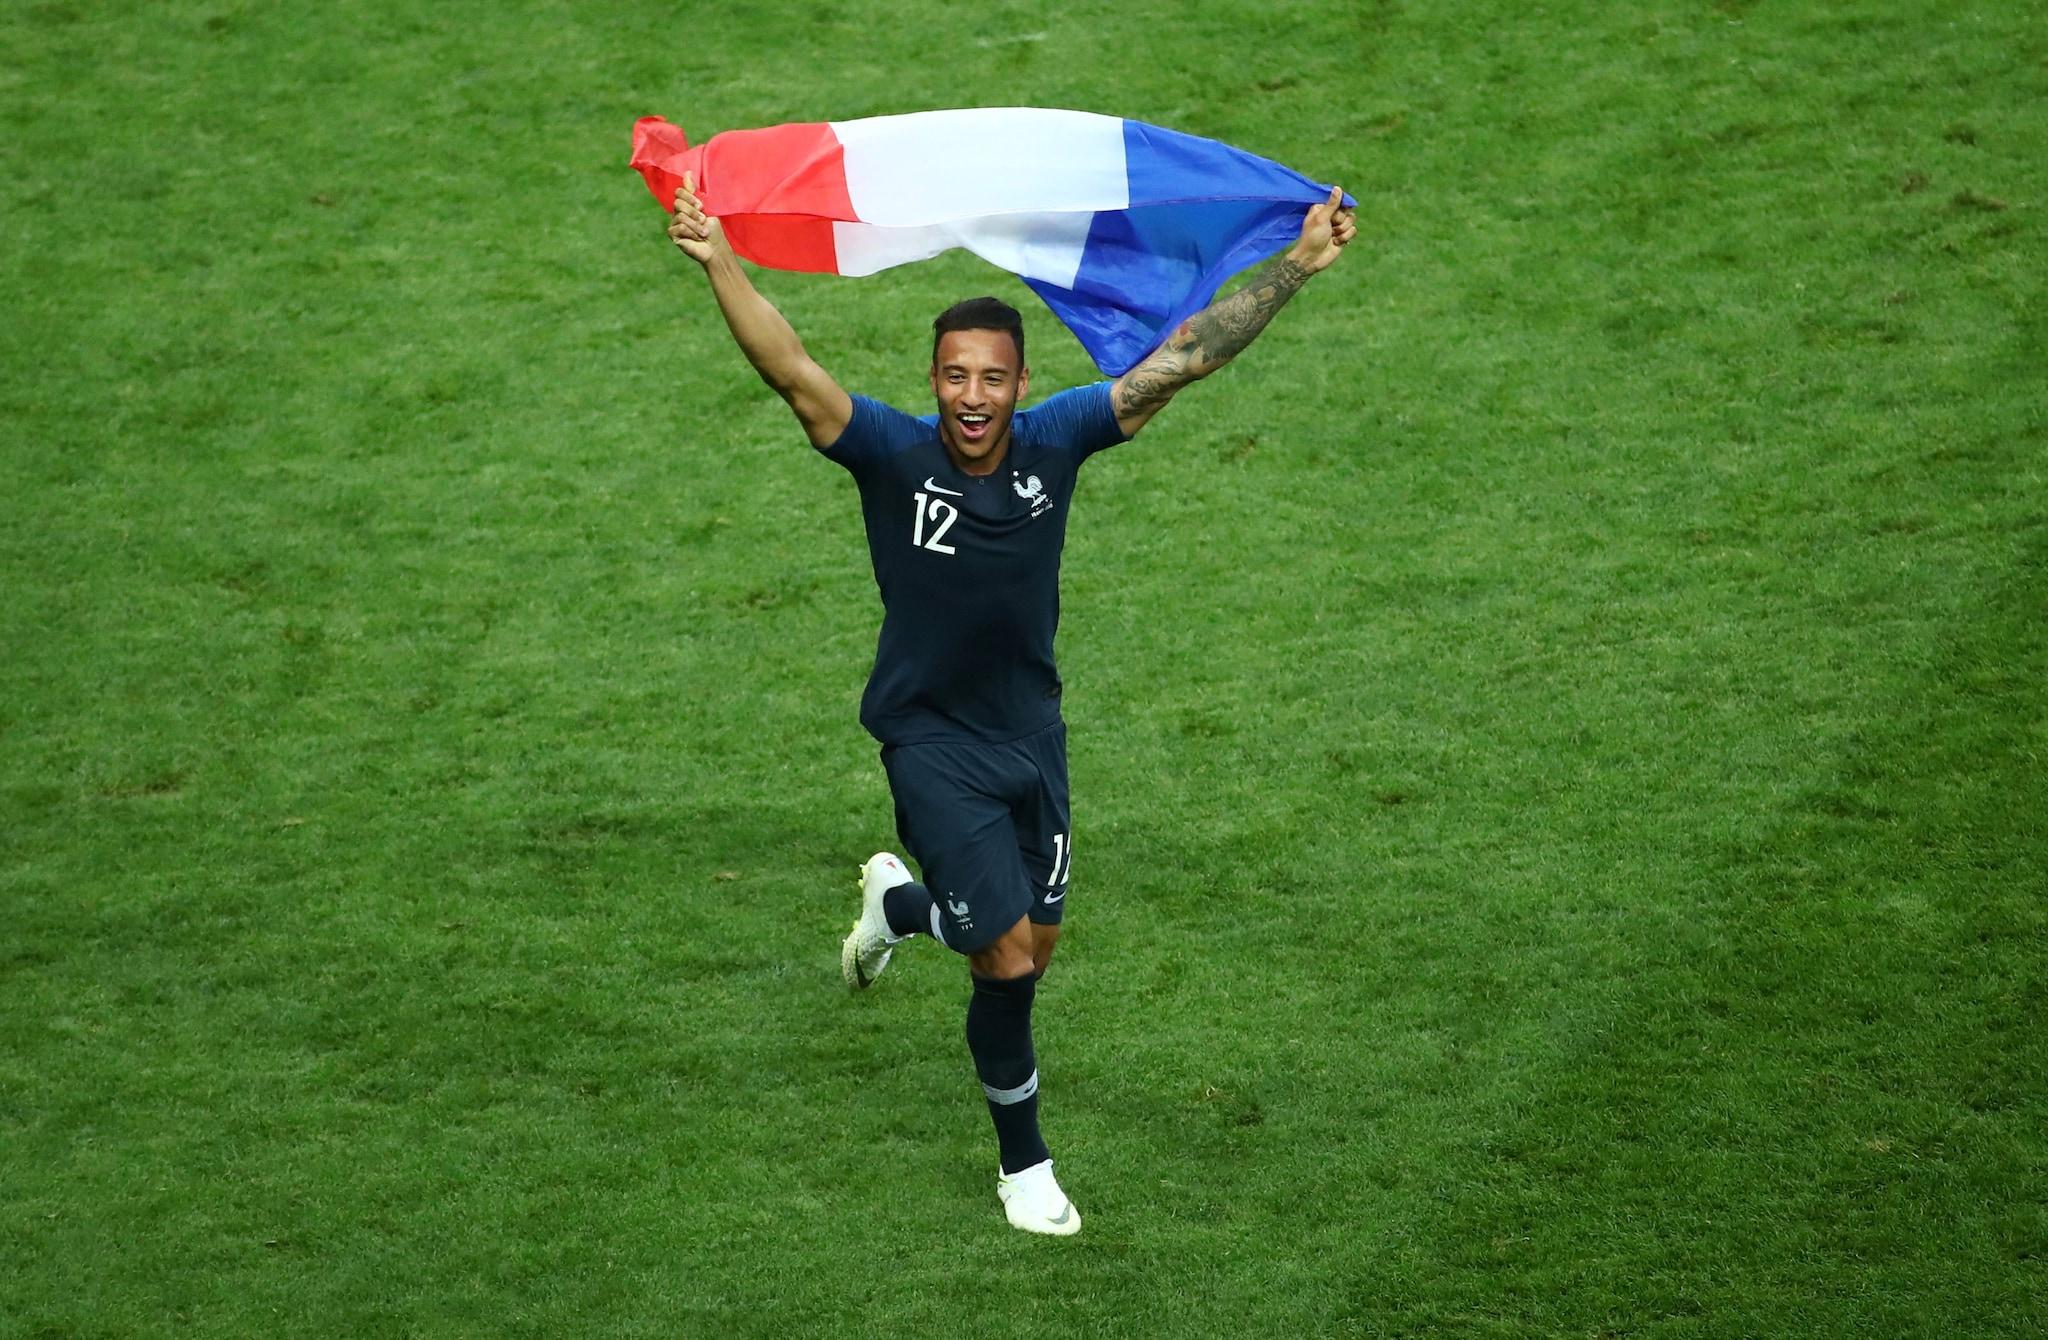 Soccer Football - World Cup - Final - France v Croatia - Luzhniki Stadium, Moscow, Russia - July 15, 2018 France's Corentin Tolisso celebrates winning the World Cup REUTERS/Michael Dalder